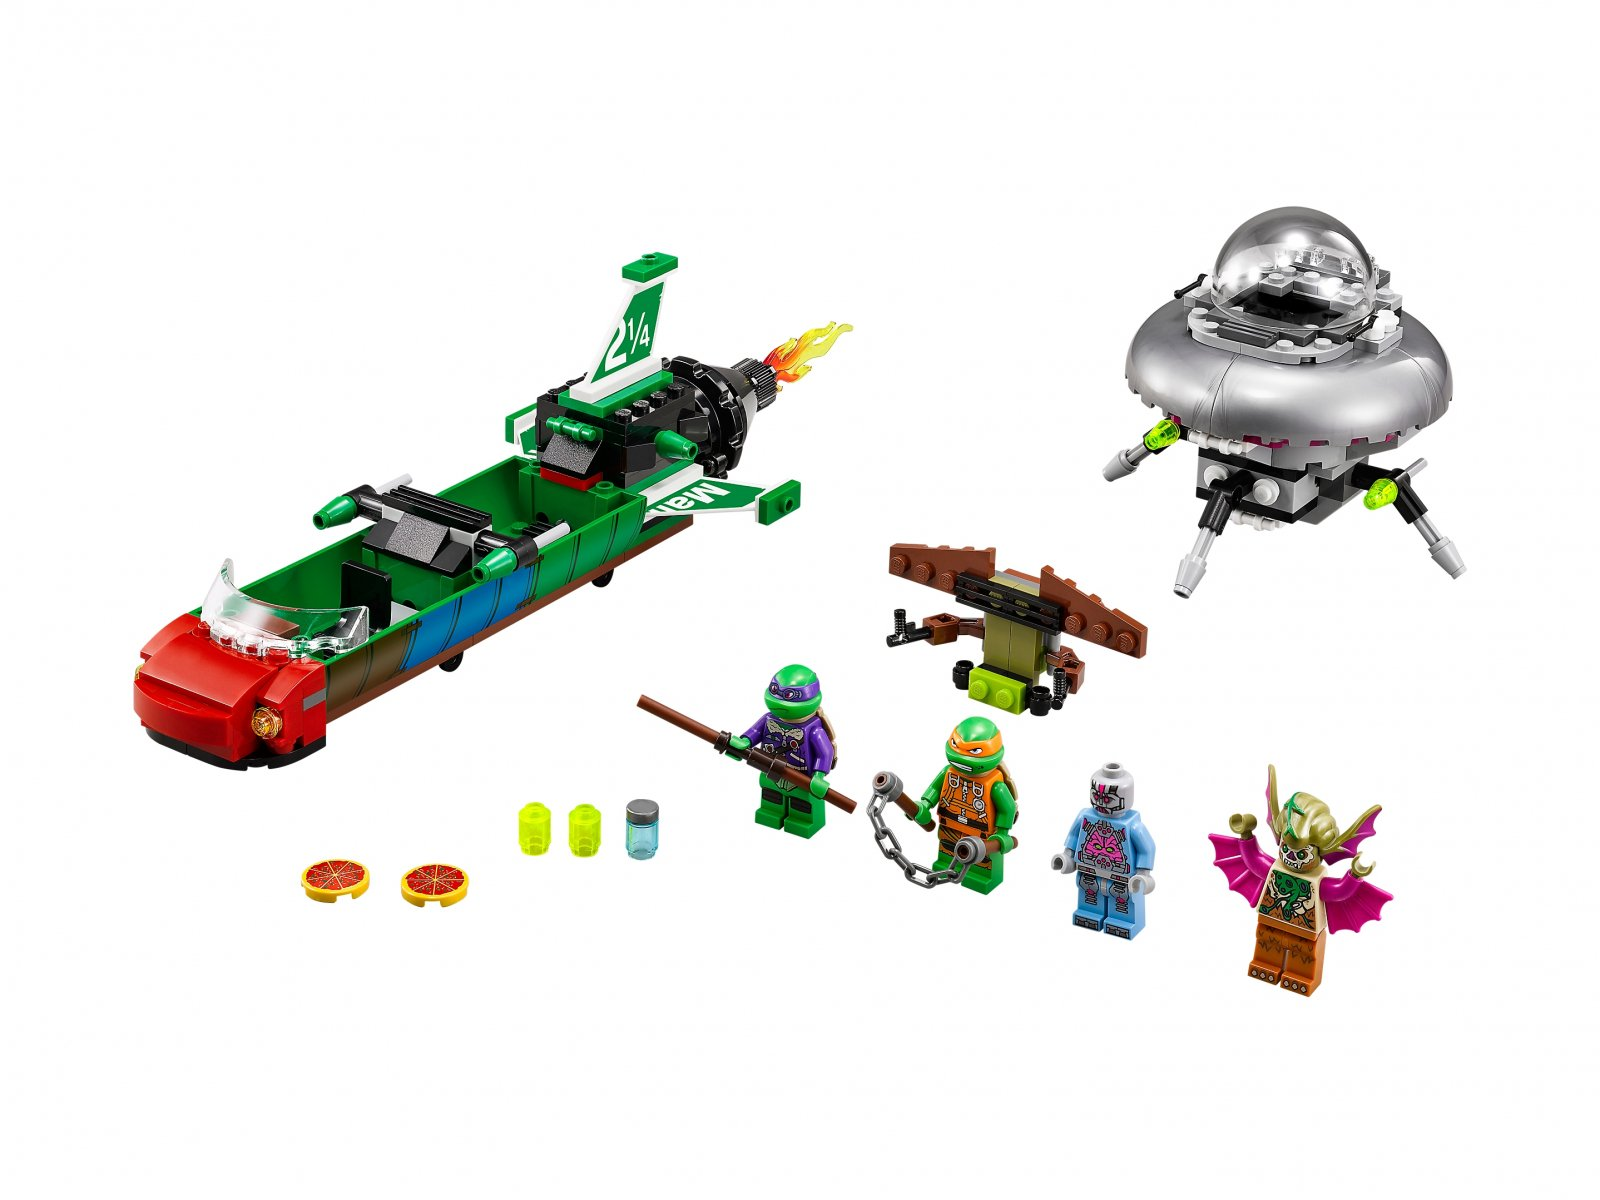 LEGO Teenage Mutant Ninja Turtles™ Podniebne uderzenie 79120